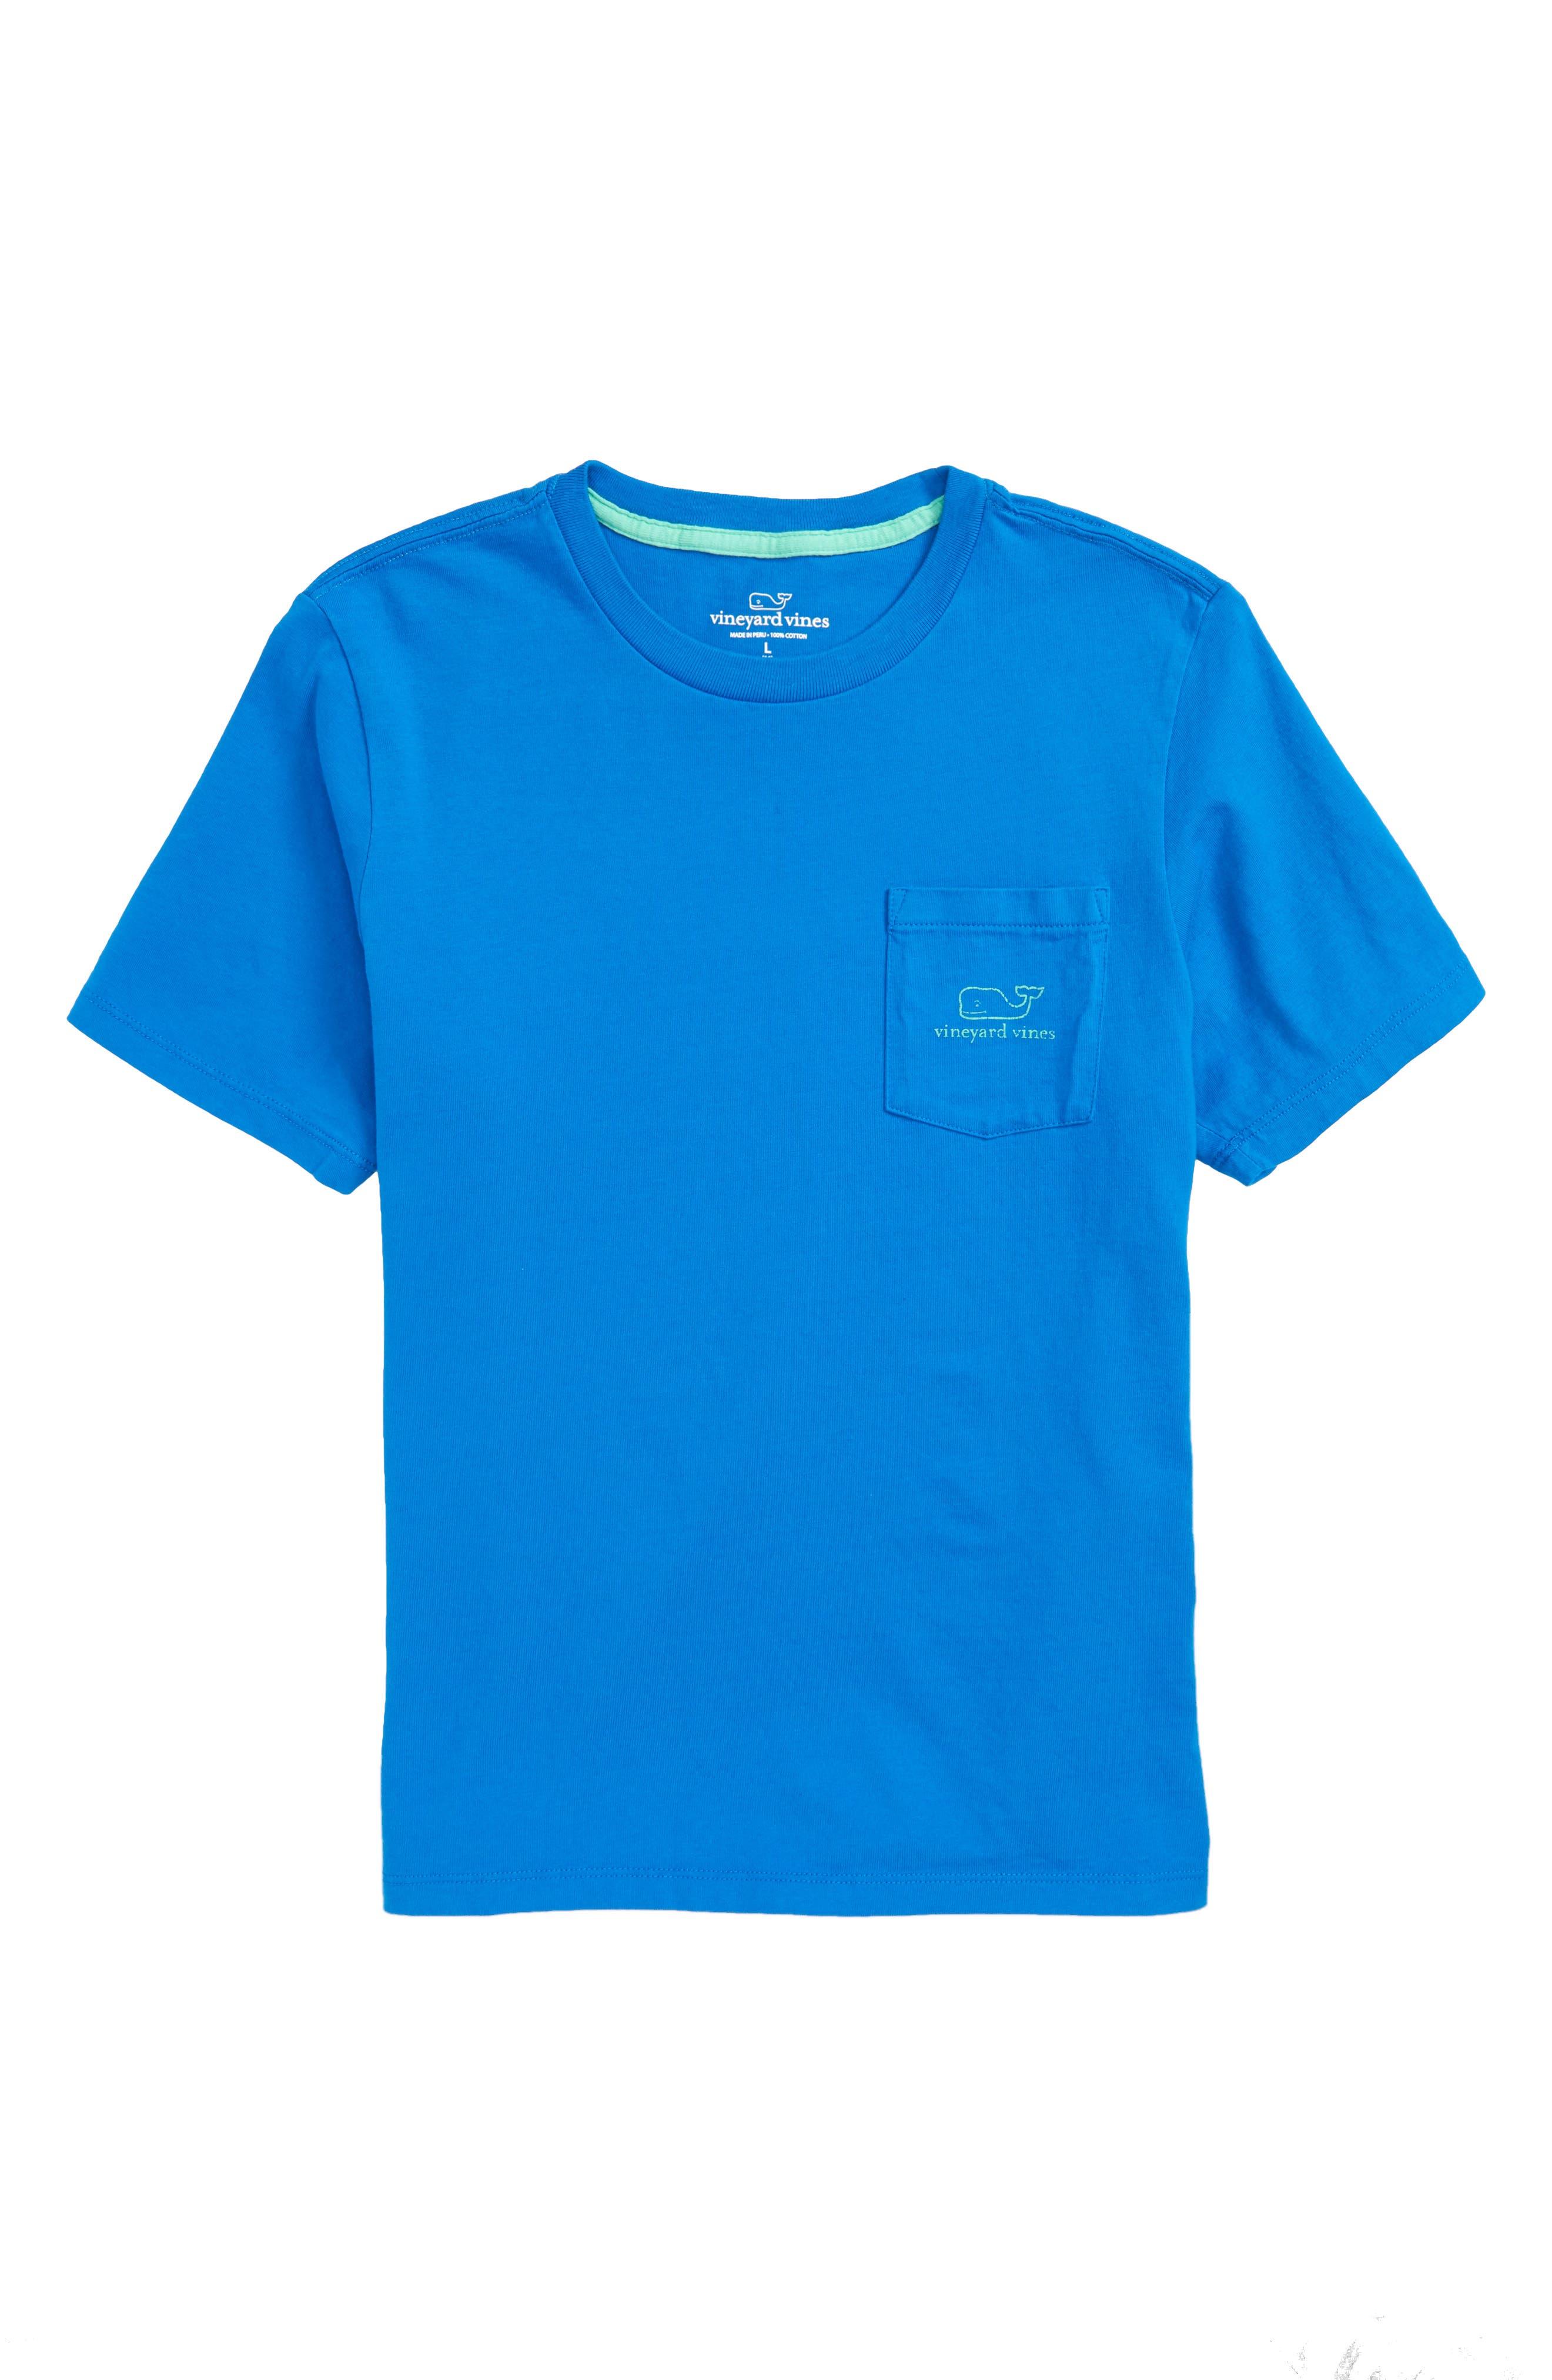 Boys Vineyard Vines Whale TShirt Size XL (18)  Blue